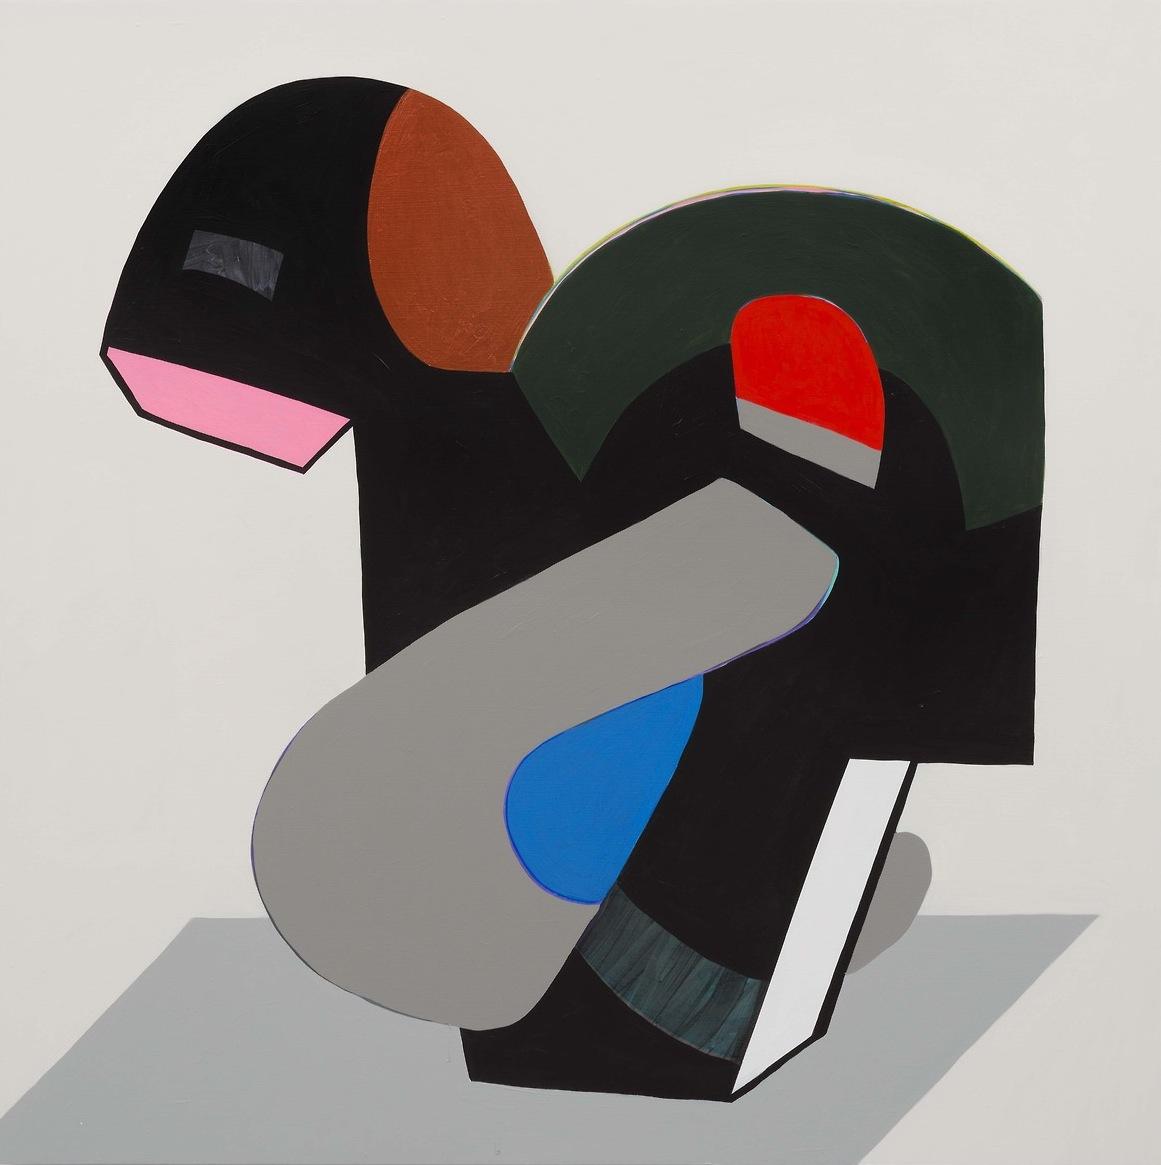 Hayal Pozanti, Technocream, acrylic on wood panel, 45 x 45 inches, 2014 (courtes